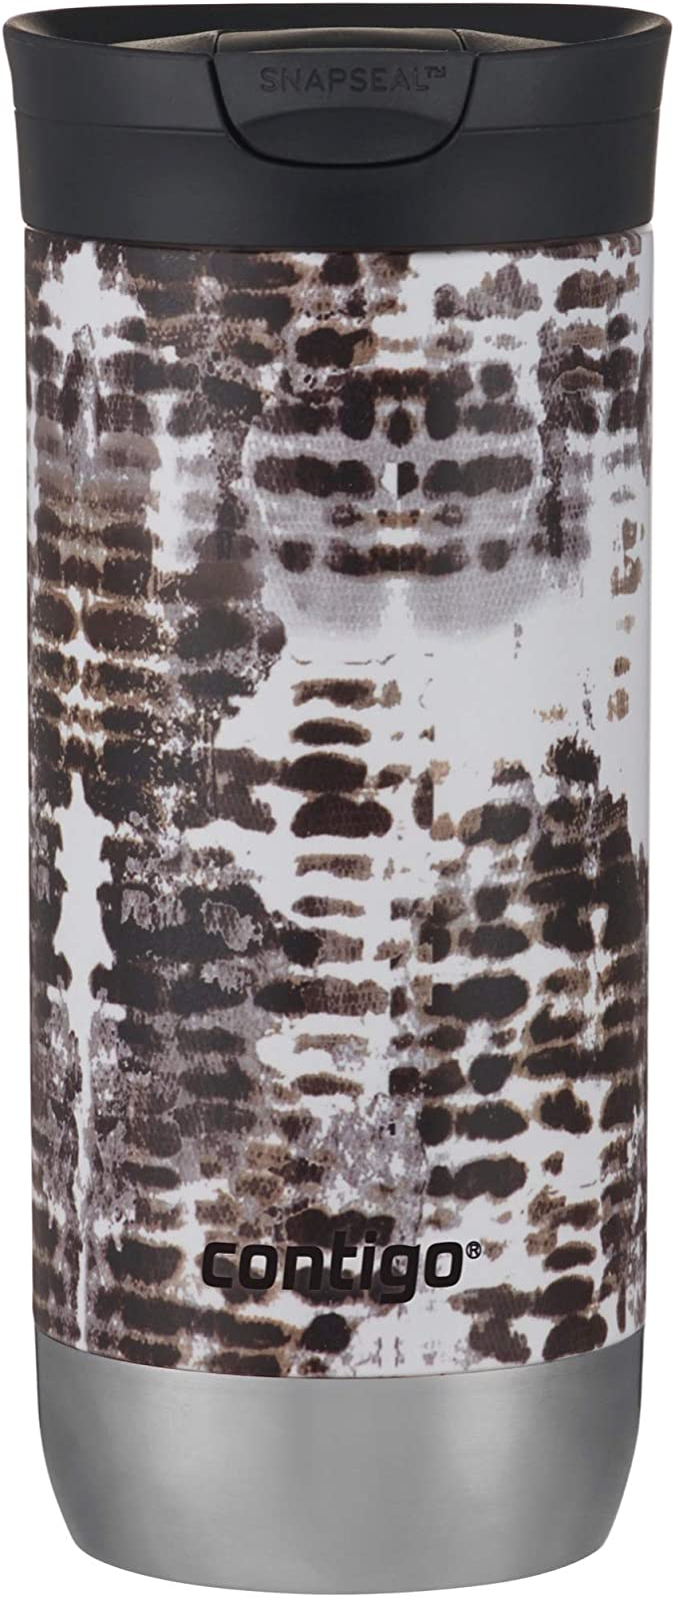 Contigo Snapseal Insulated Travel Mug, 16 Ounce, Snakeskin